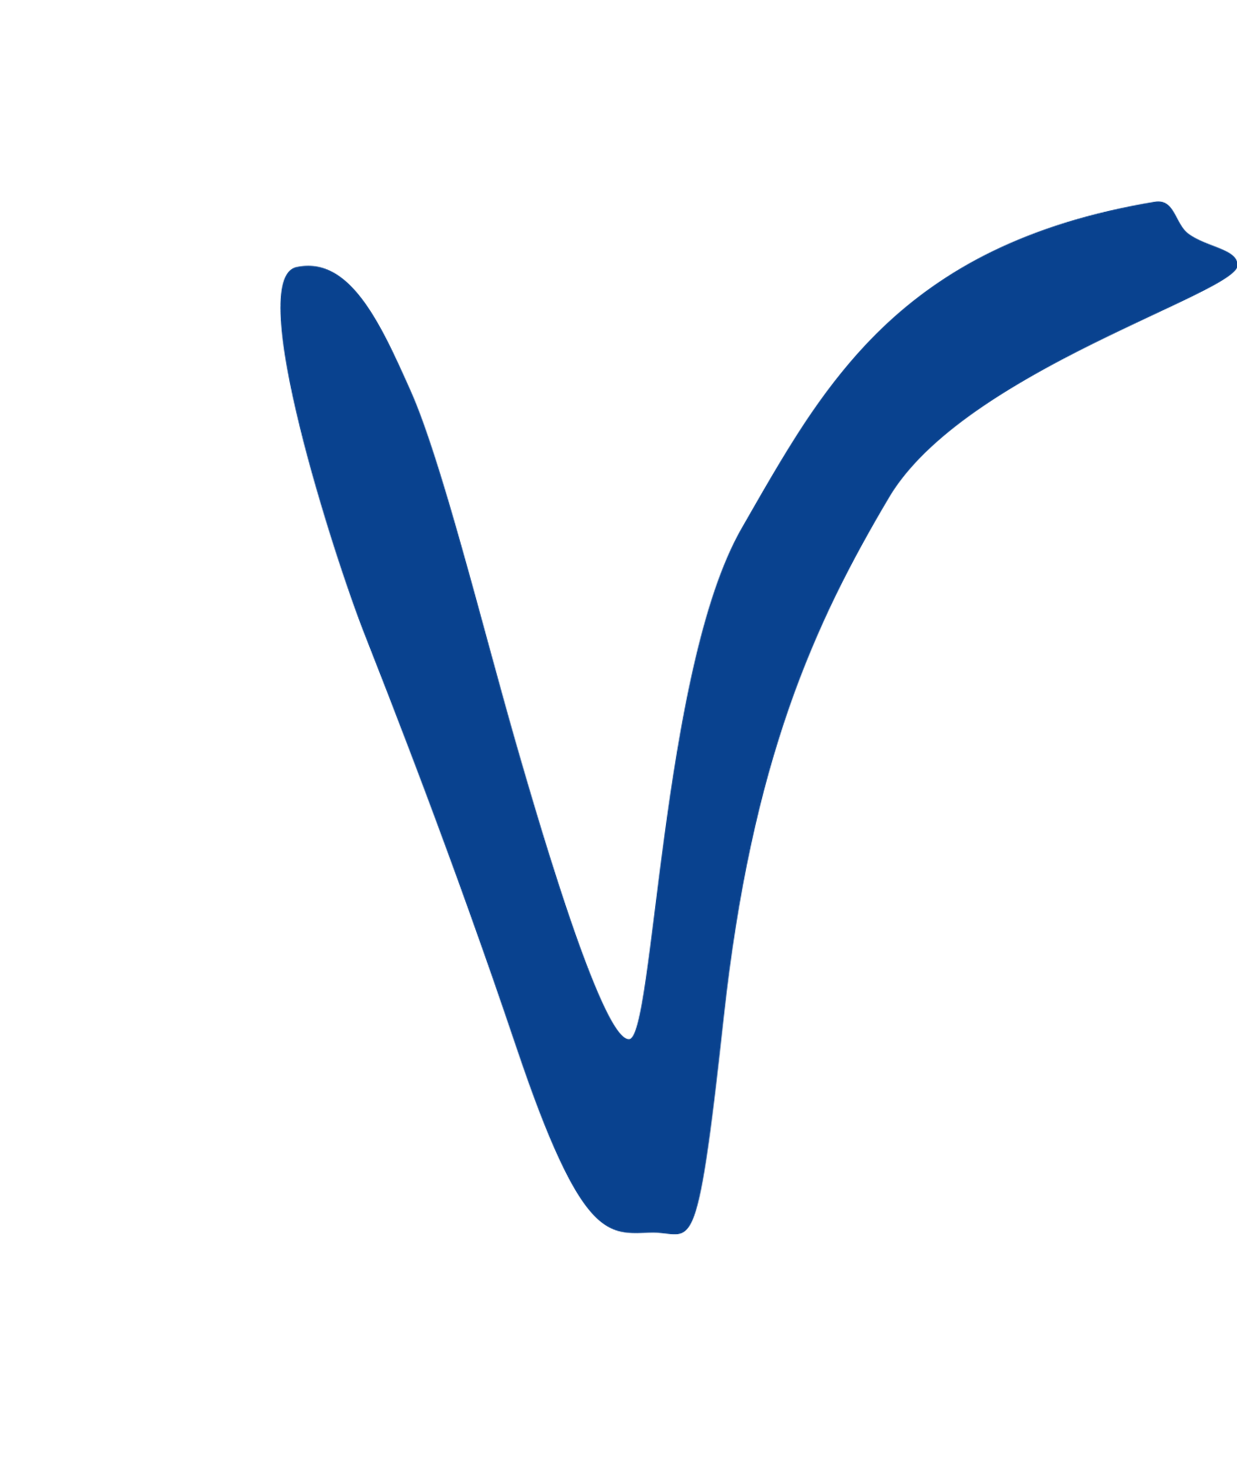 http://valor.com.tr/wp-content/uploads/2019/11/V-2.png